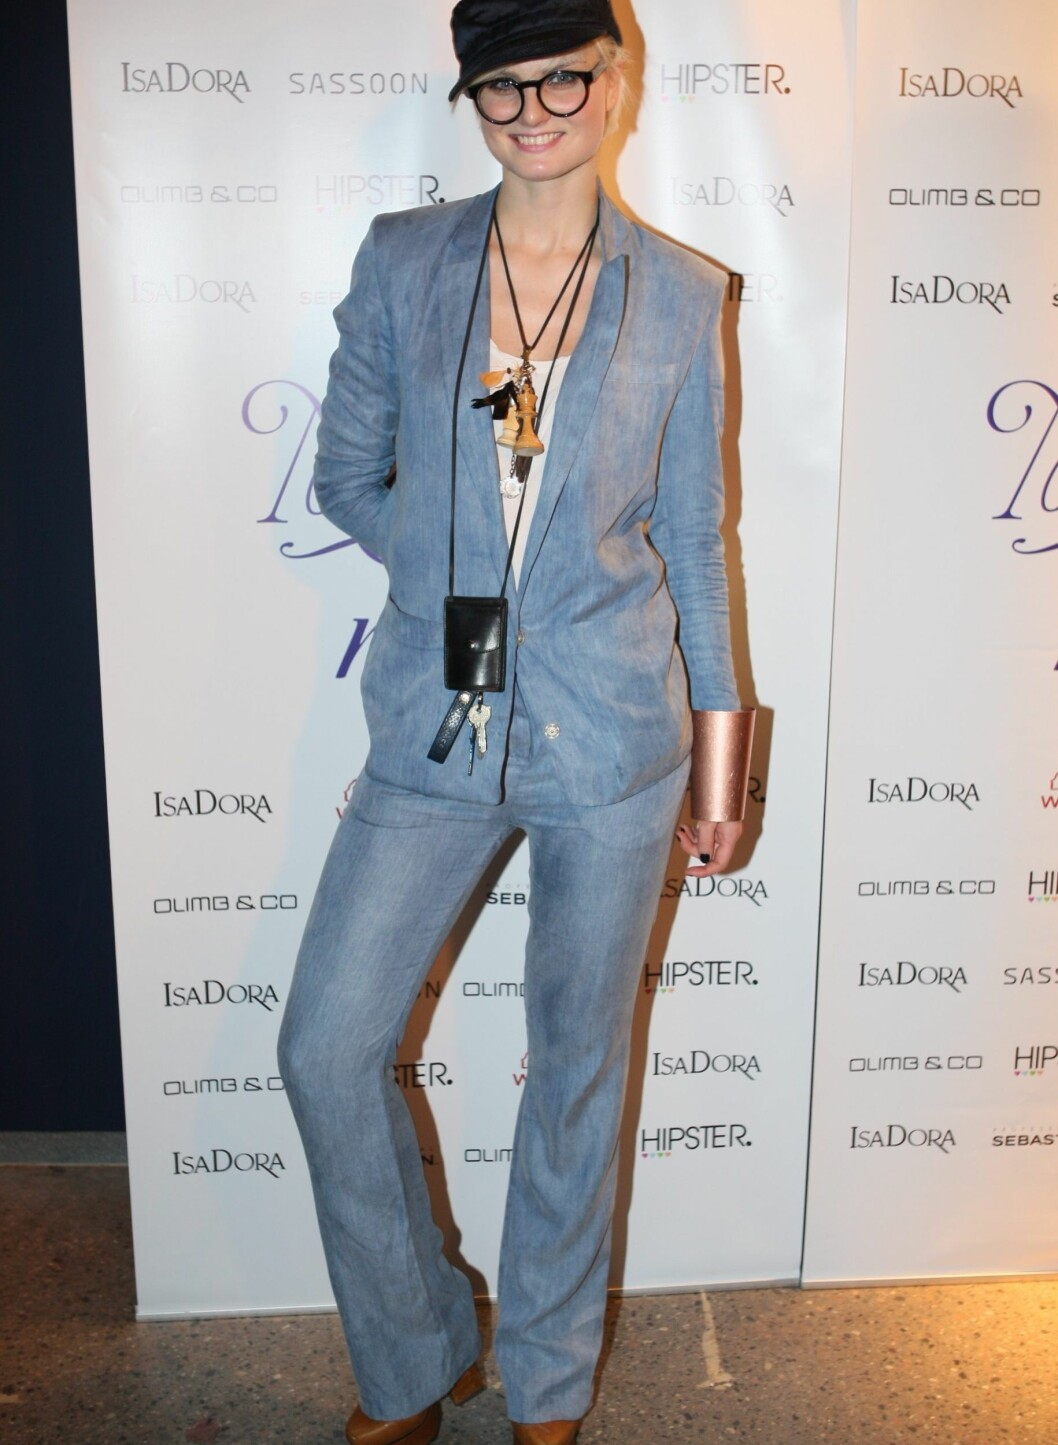 Hege Golf kom i jeansdress fra Acne, H&M Lanvin-cap og Dior-briller. Rundt halsen hang et sjakkbrikkesmykke og husnøklene hennes i en liten Acne-veske. Foto: Per Ervland